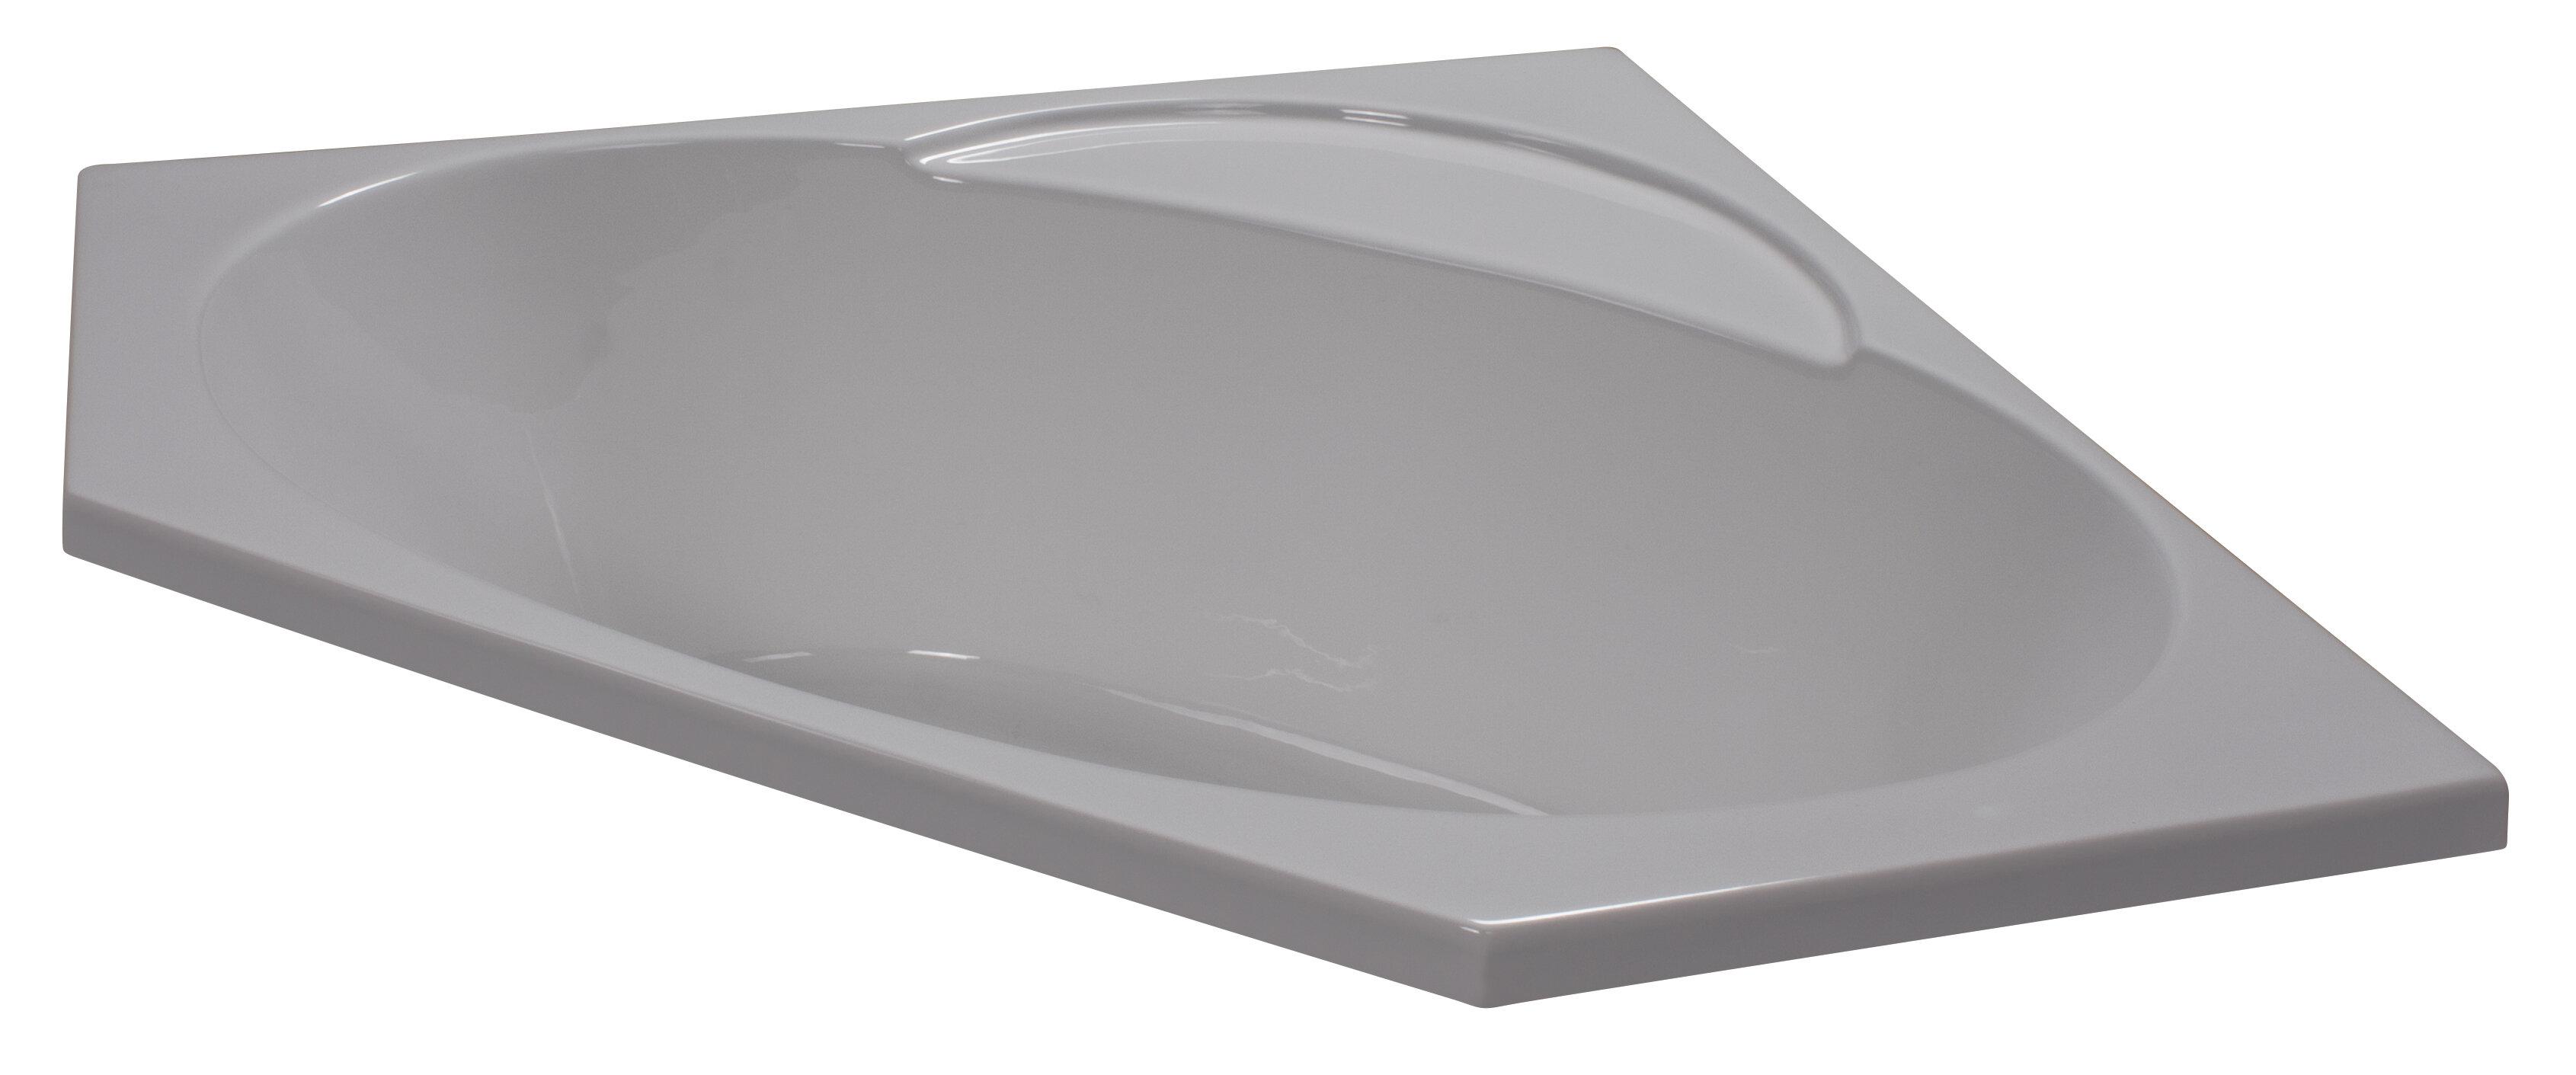 48 X 48 Soaker Corner Bathtub